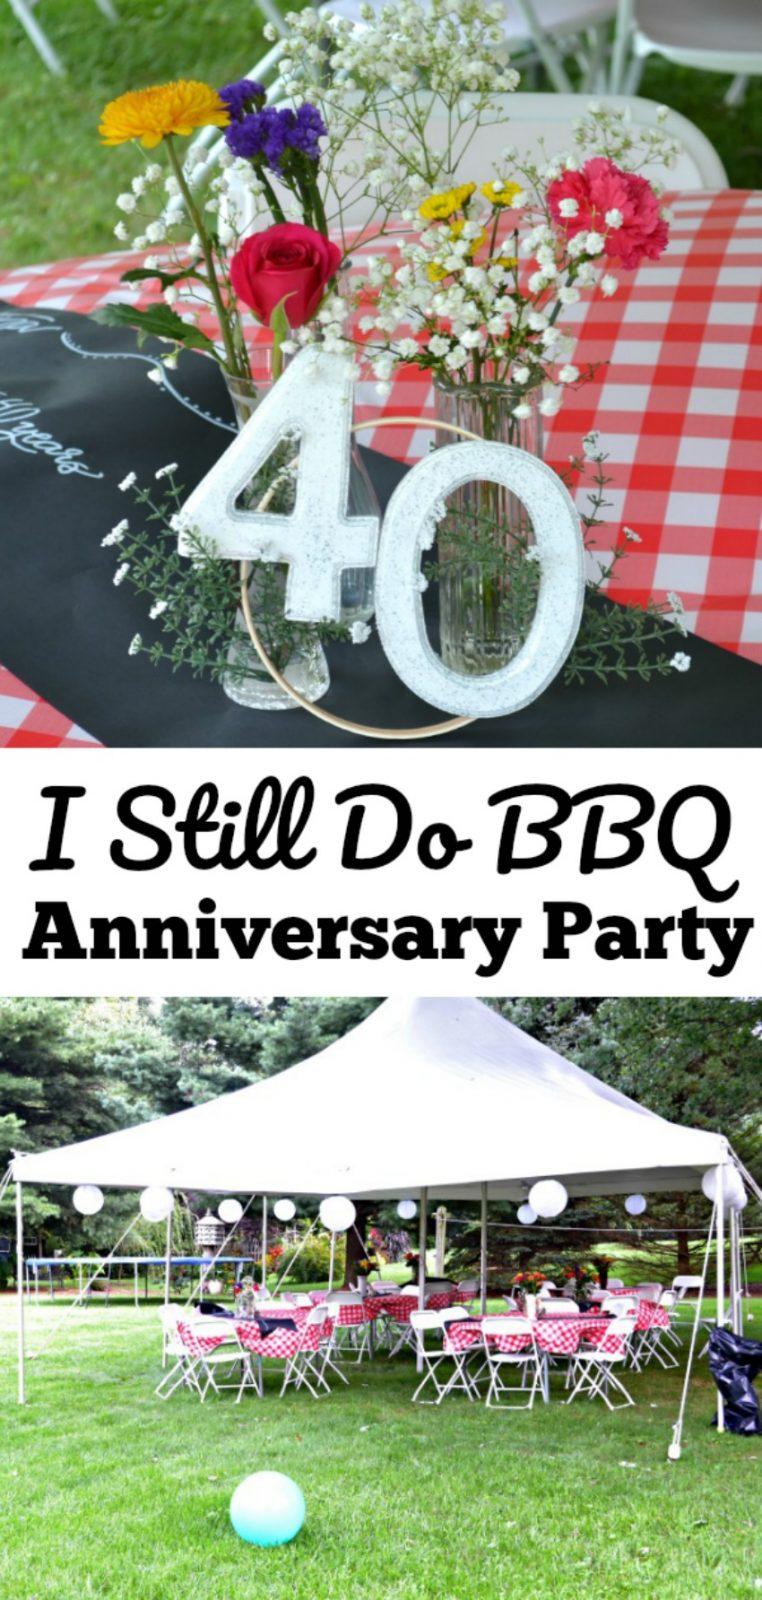 I Still Do BBQ Anniversary Party